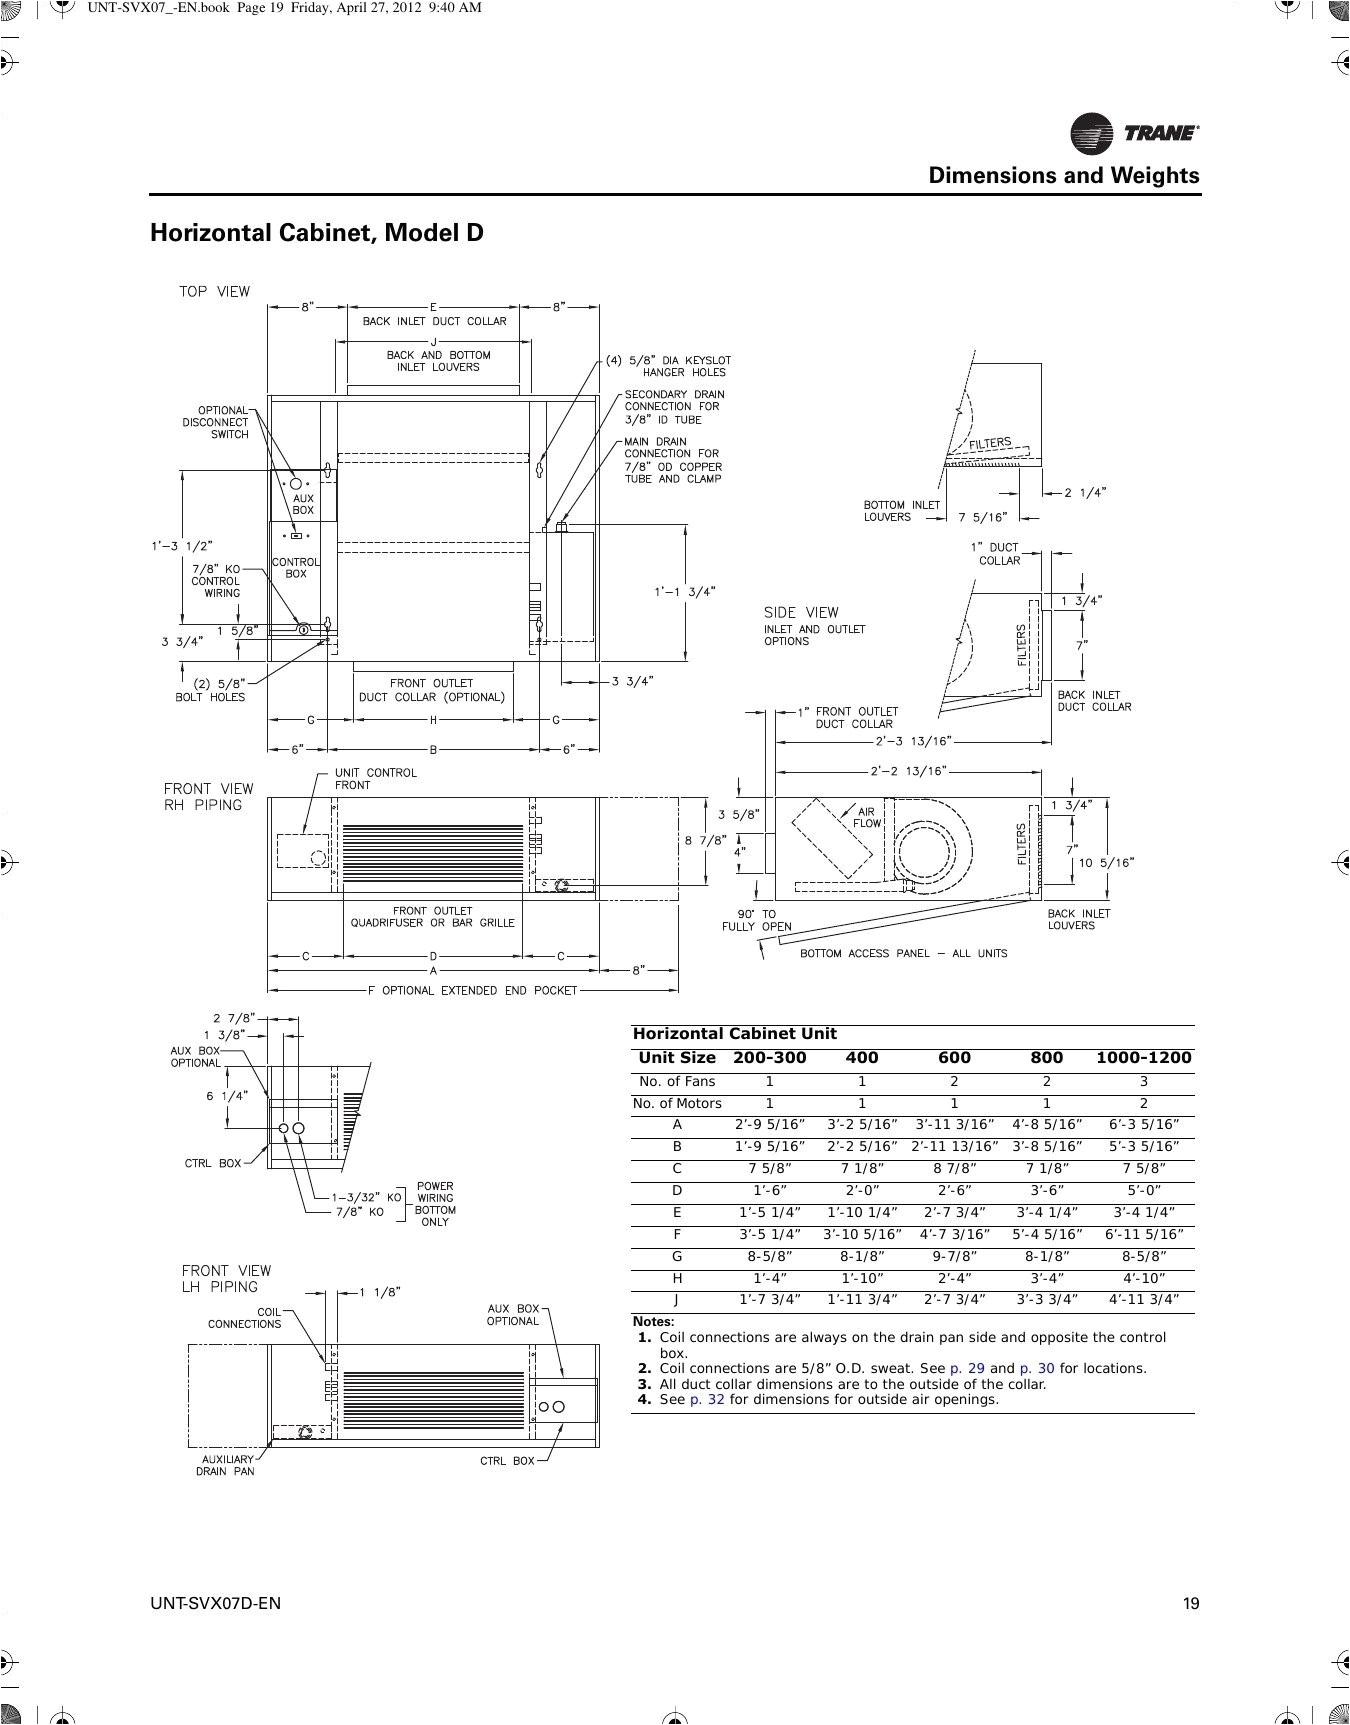 effikal model gvd wiring diagram wiring diagram effikal model gvd wiring diagram